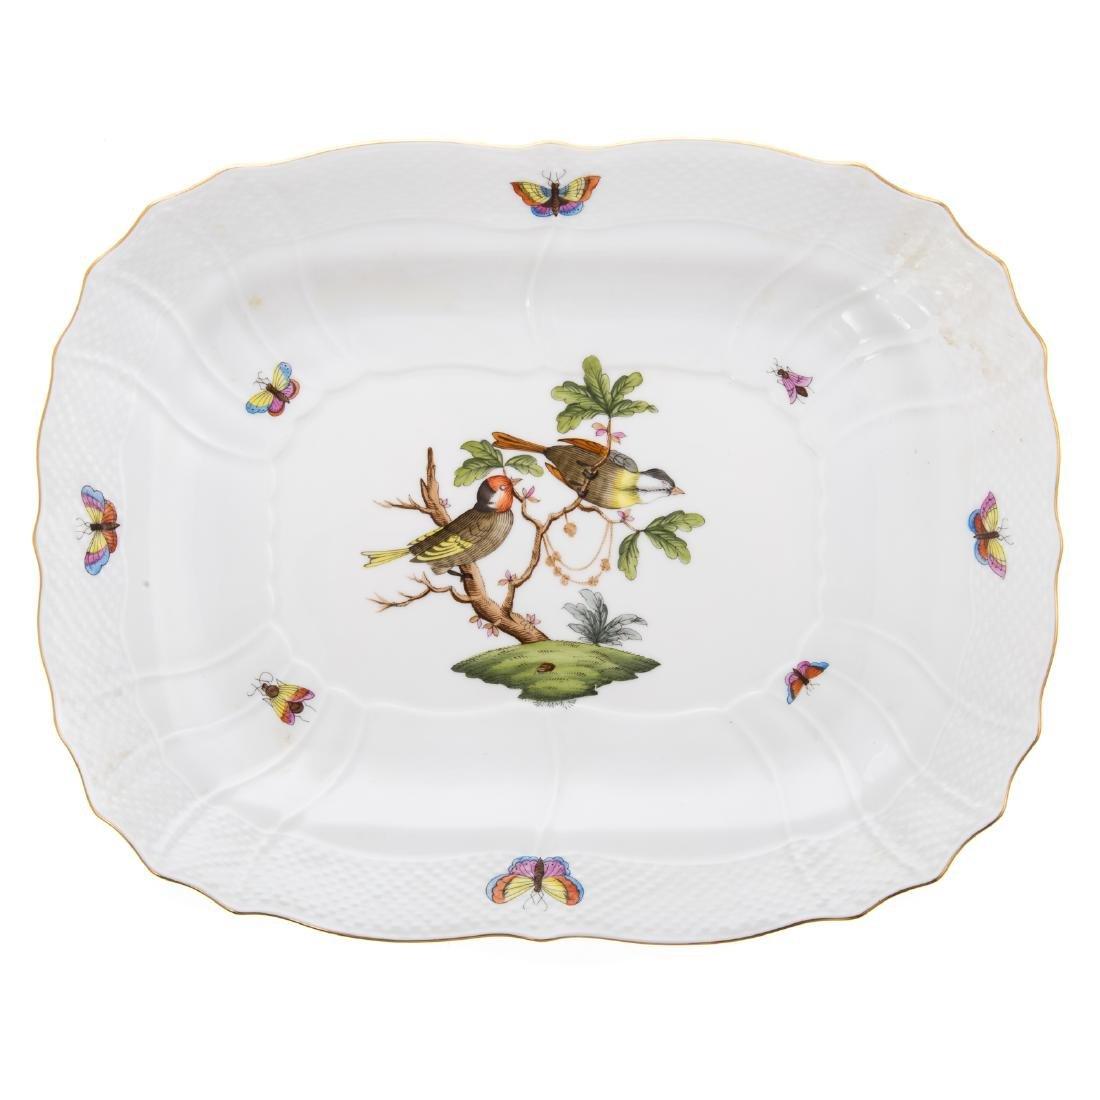 Herend Rothschild Bird soup tureen and platter - 7